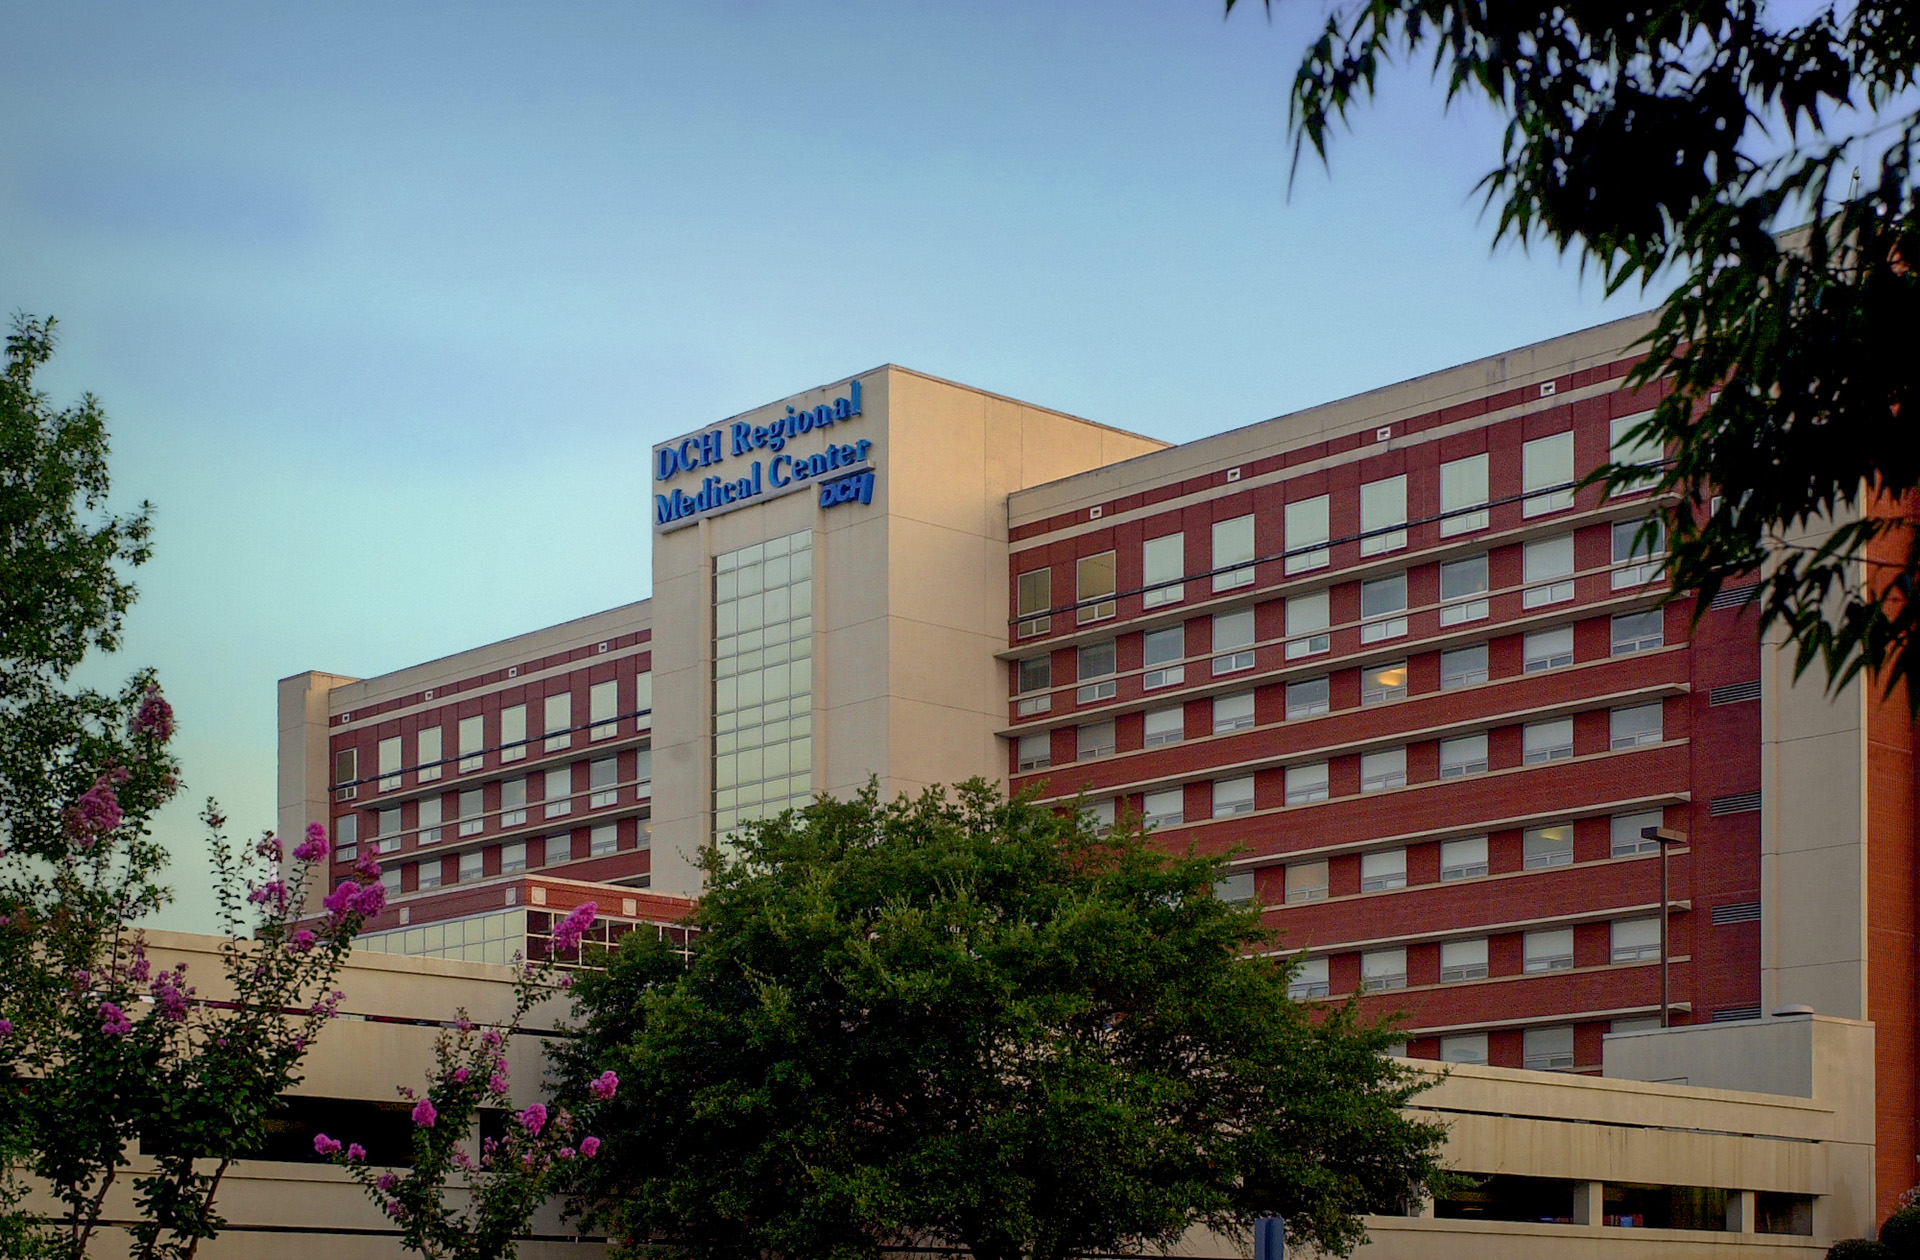 Druid City Hospital